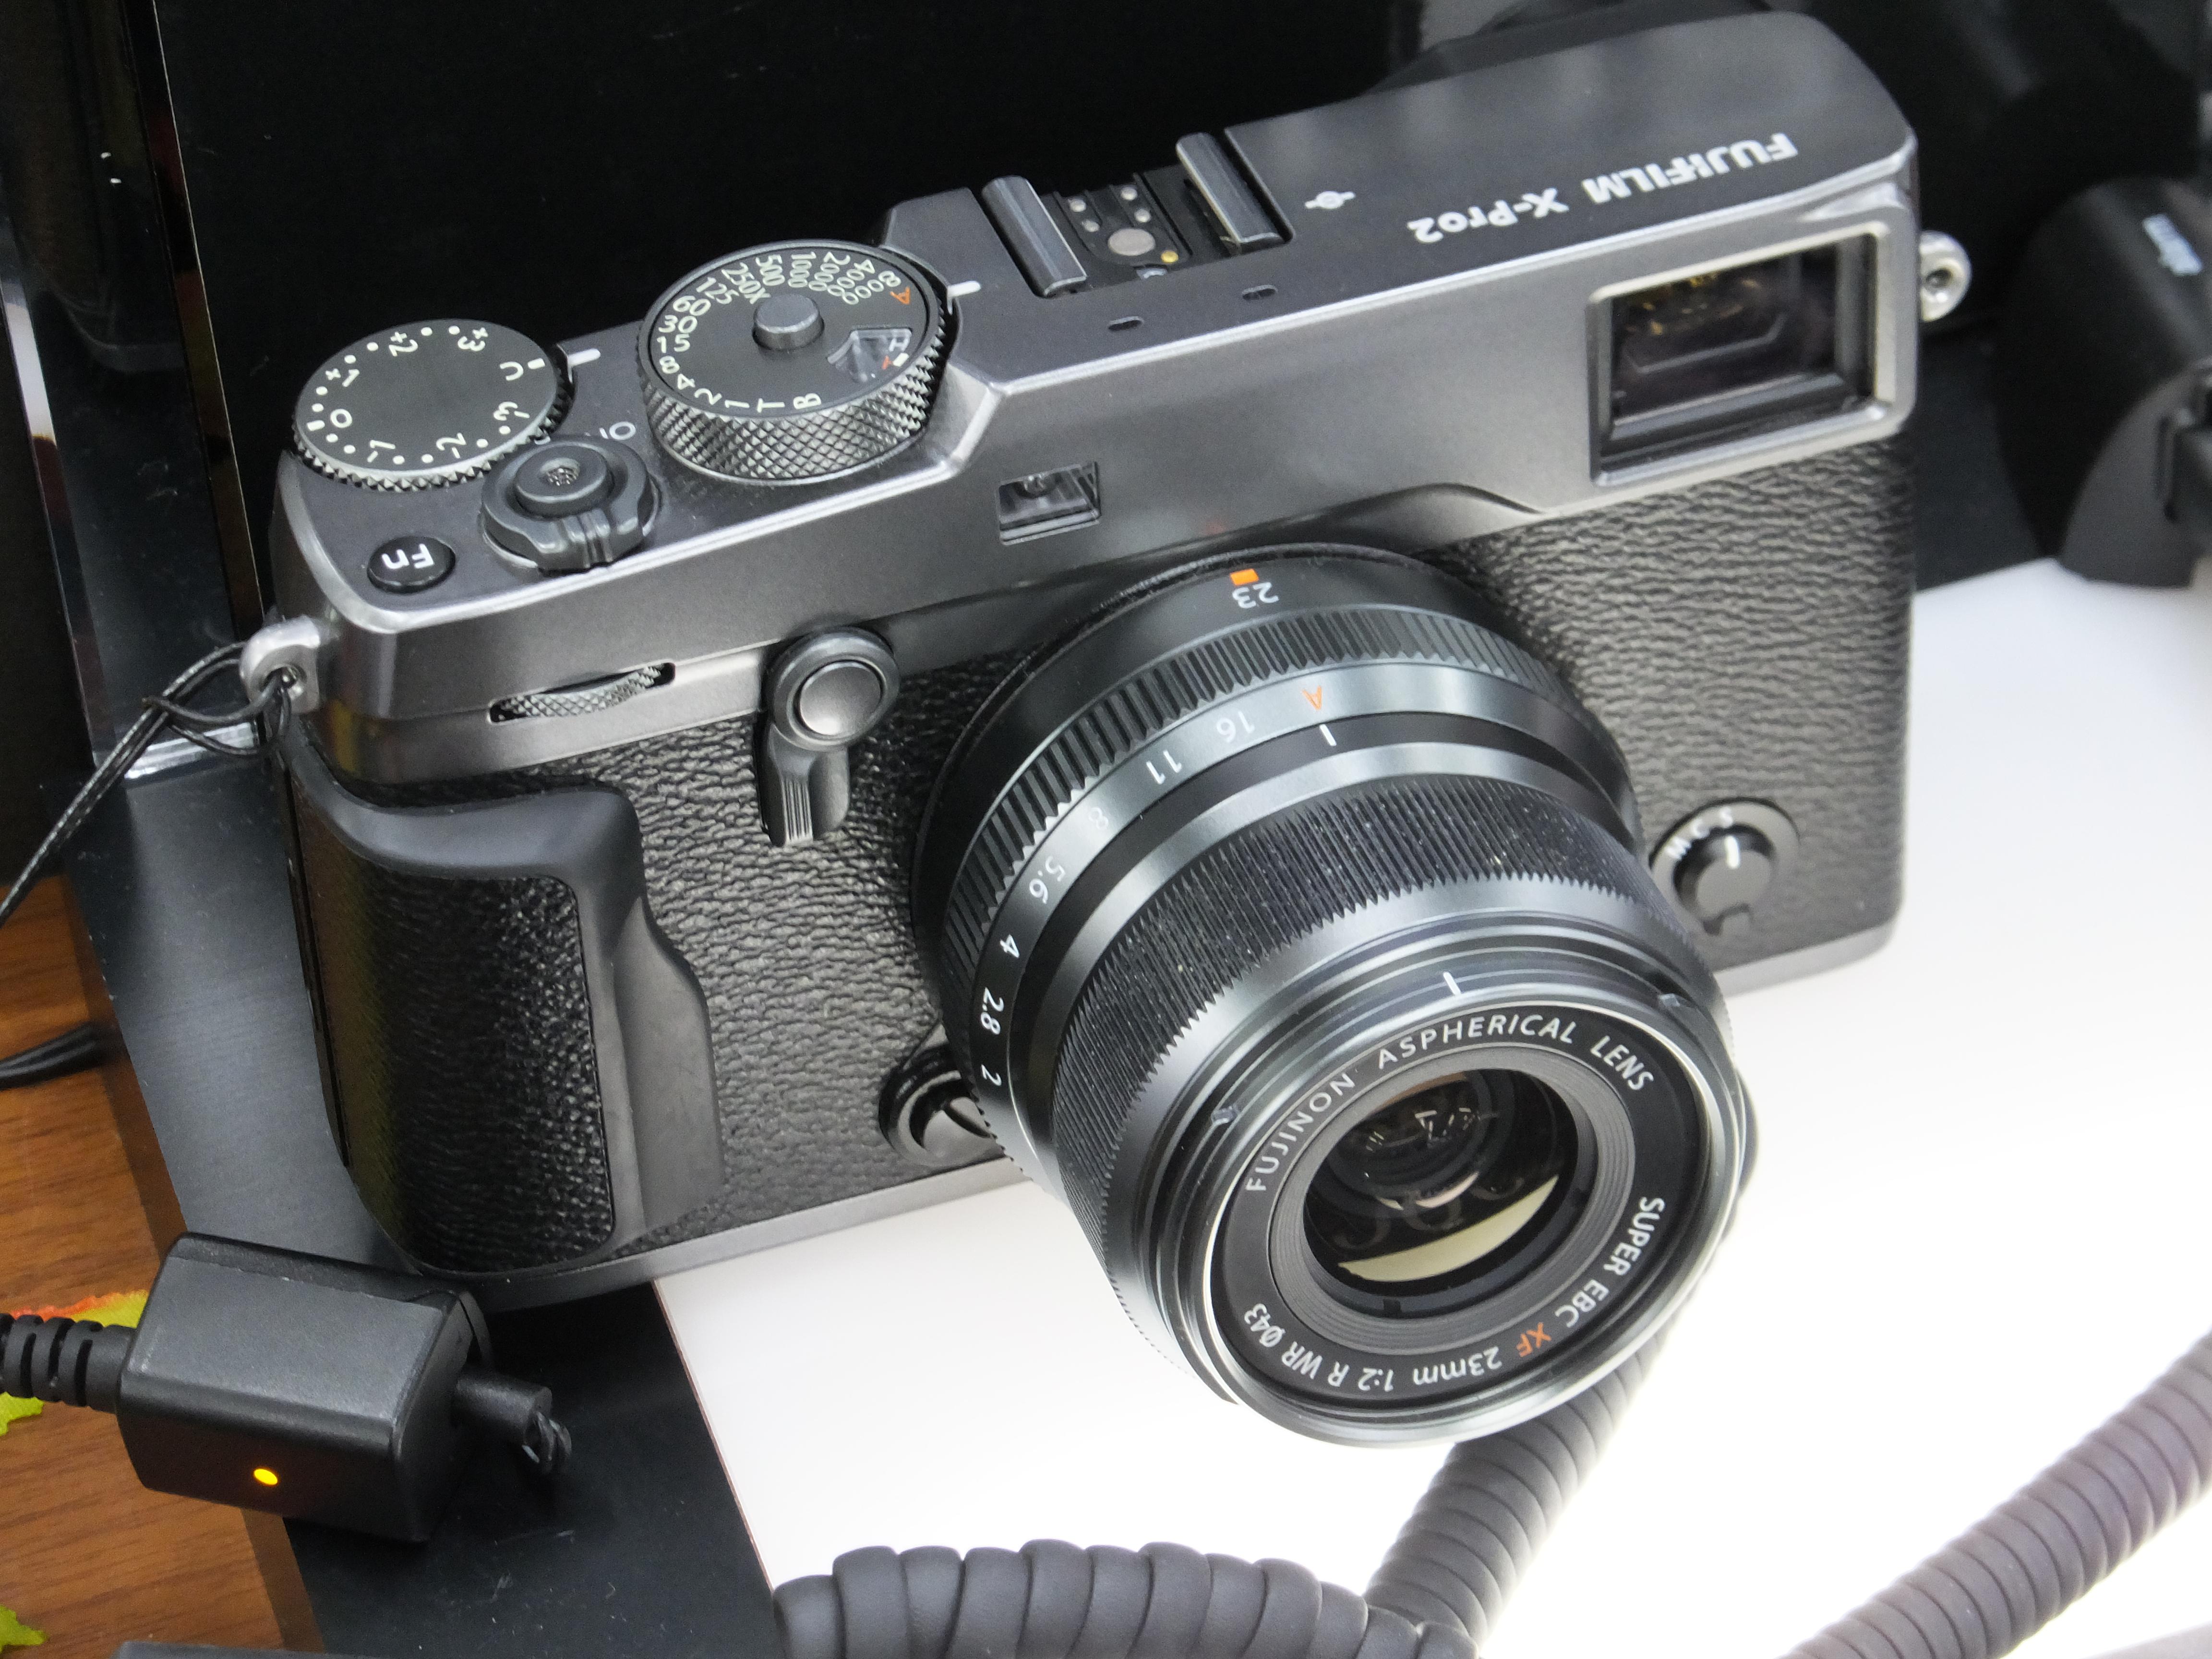 Fujifilm X Pro2 Wikipedia E3 Kit Xf 23mm F2 Black 35mm Graphite Edition Set With Body Xf23mm R Wr Same Colour